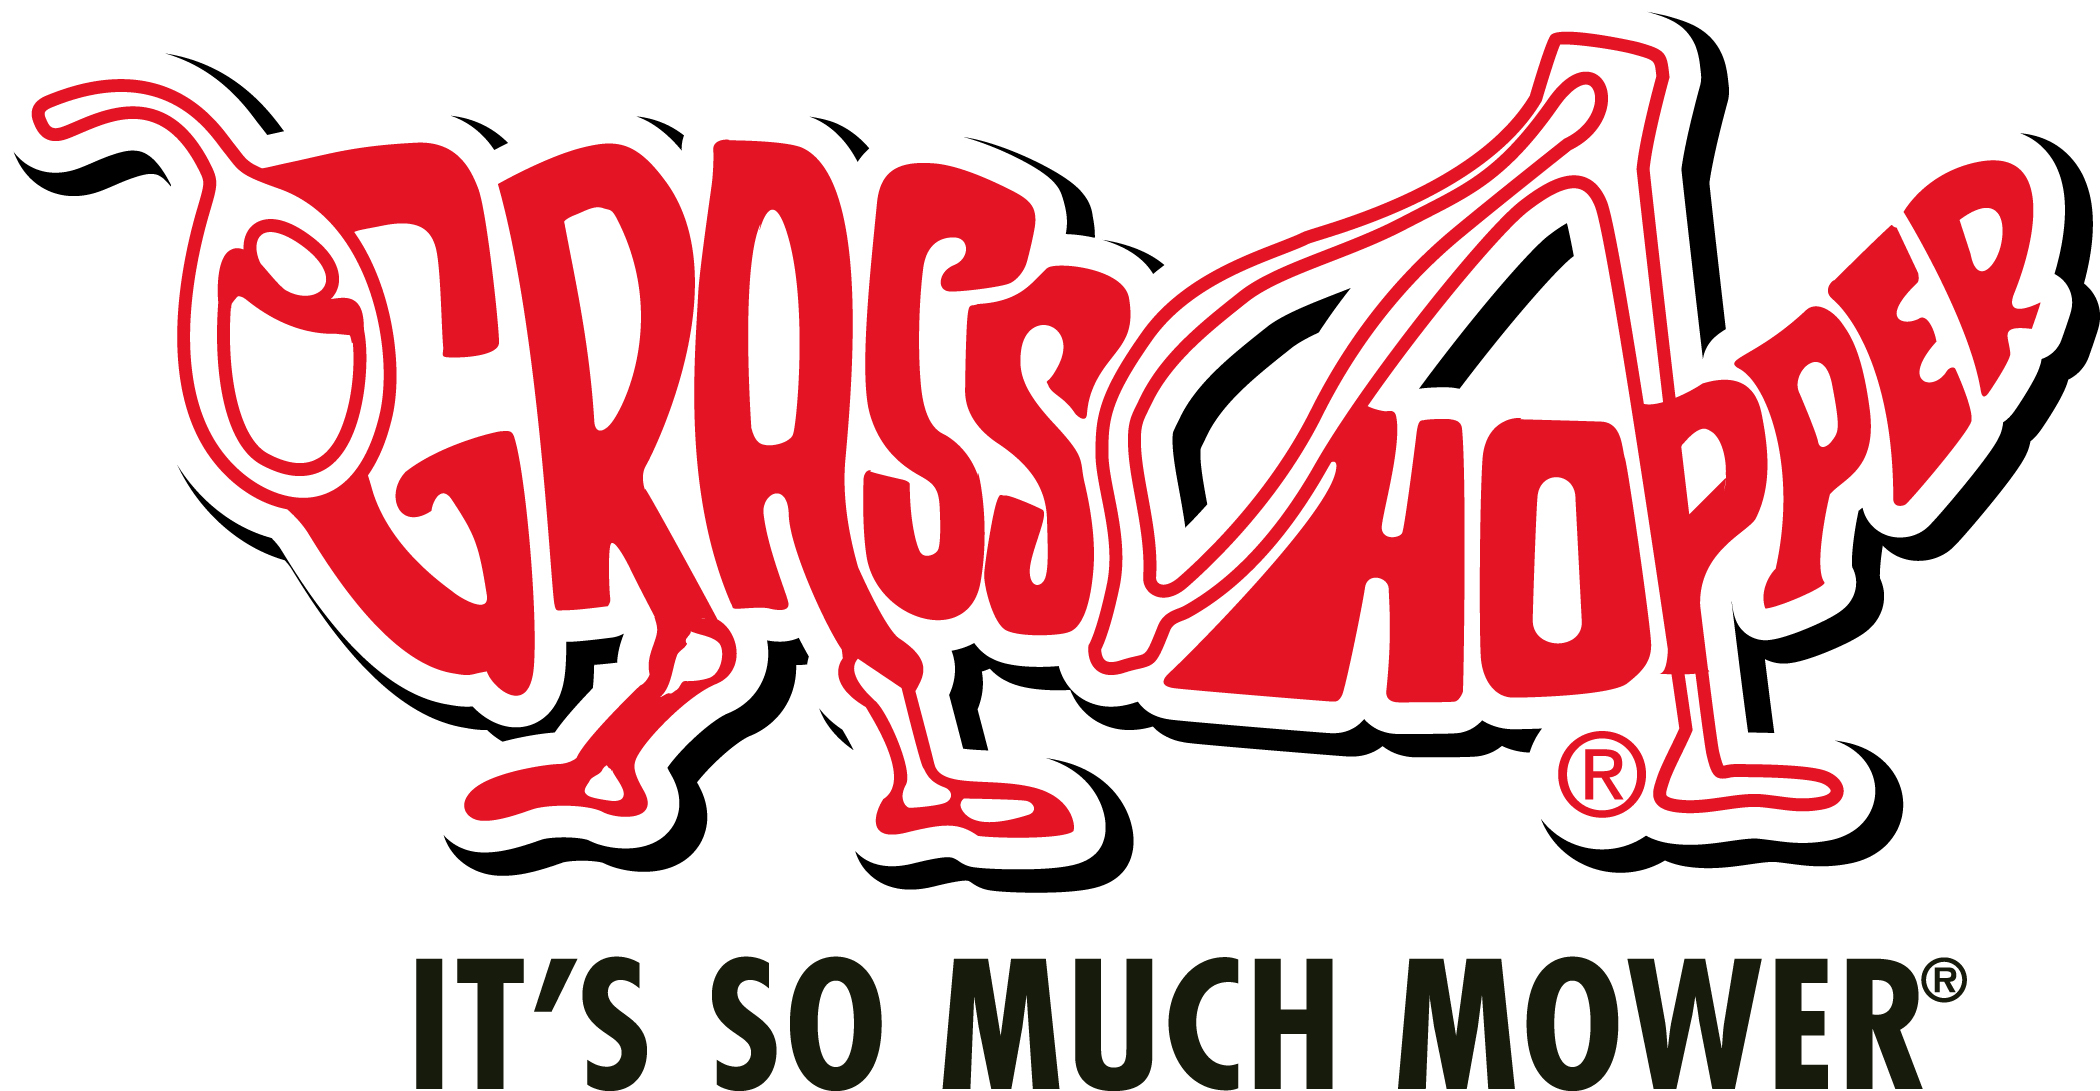 grasshopper mowers